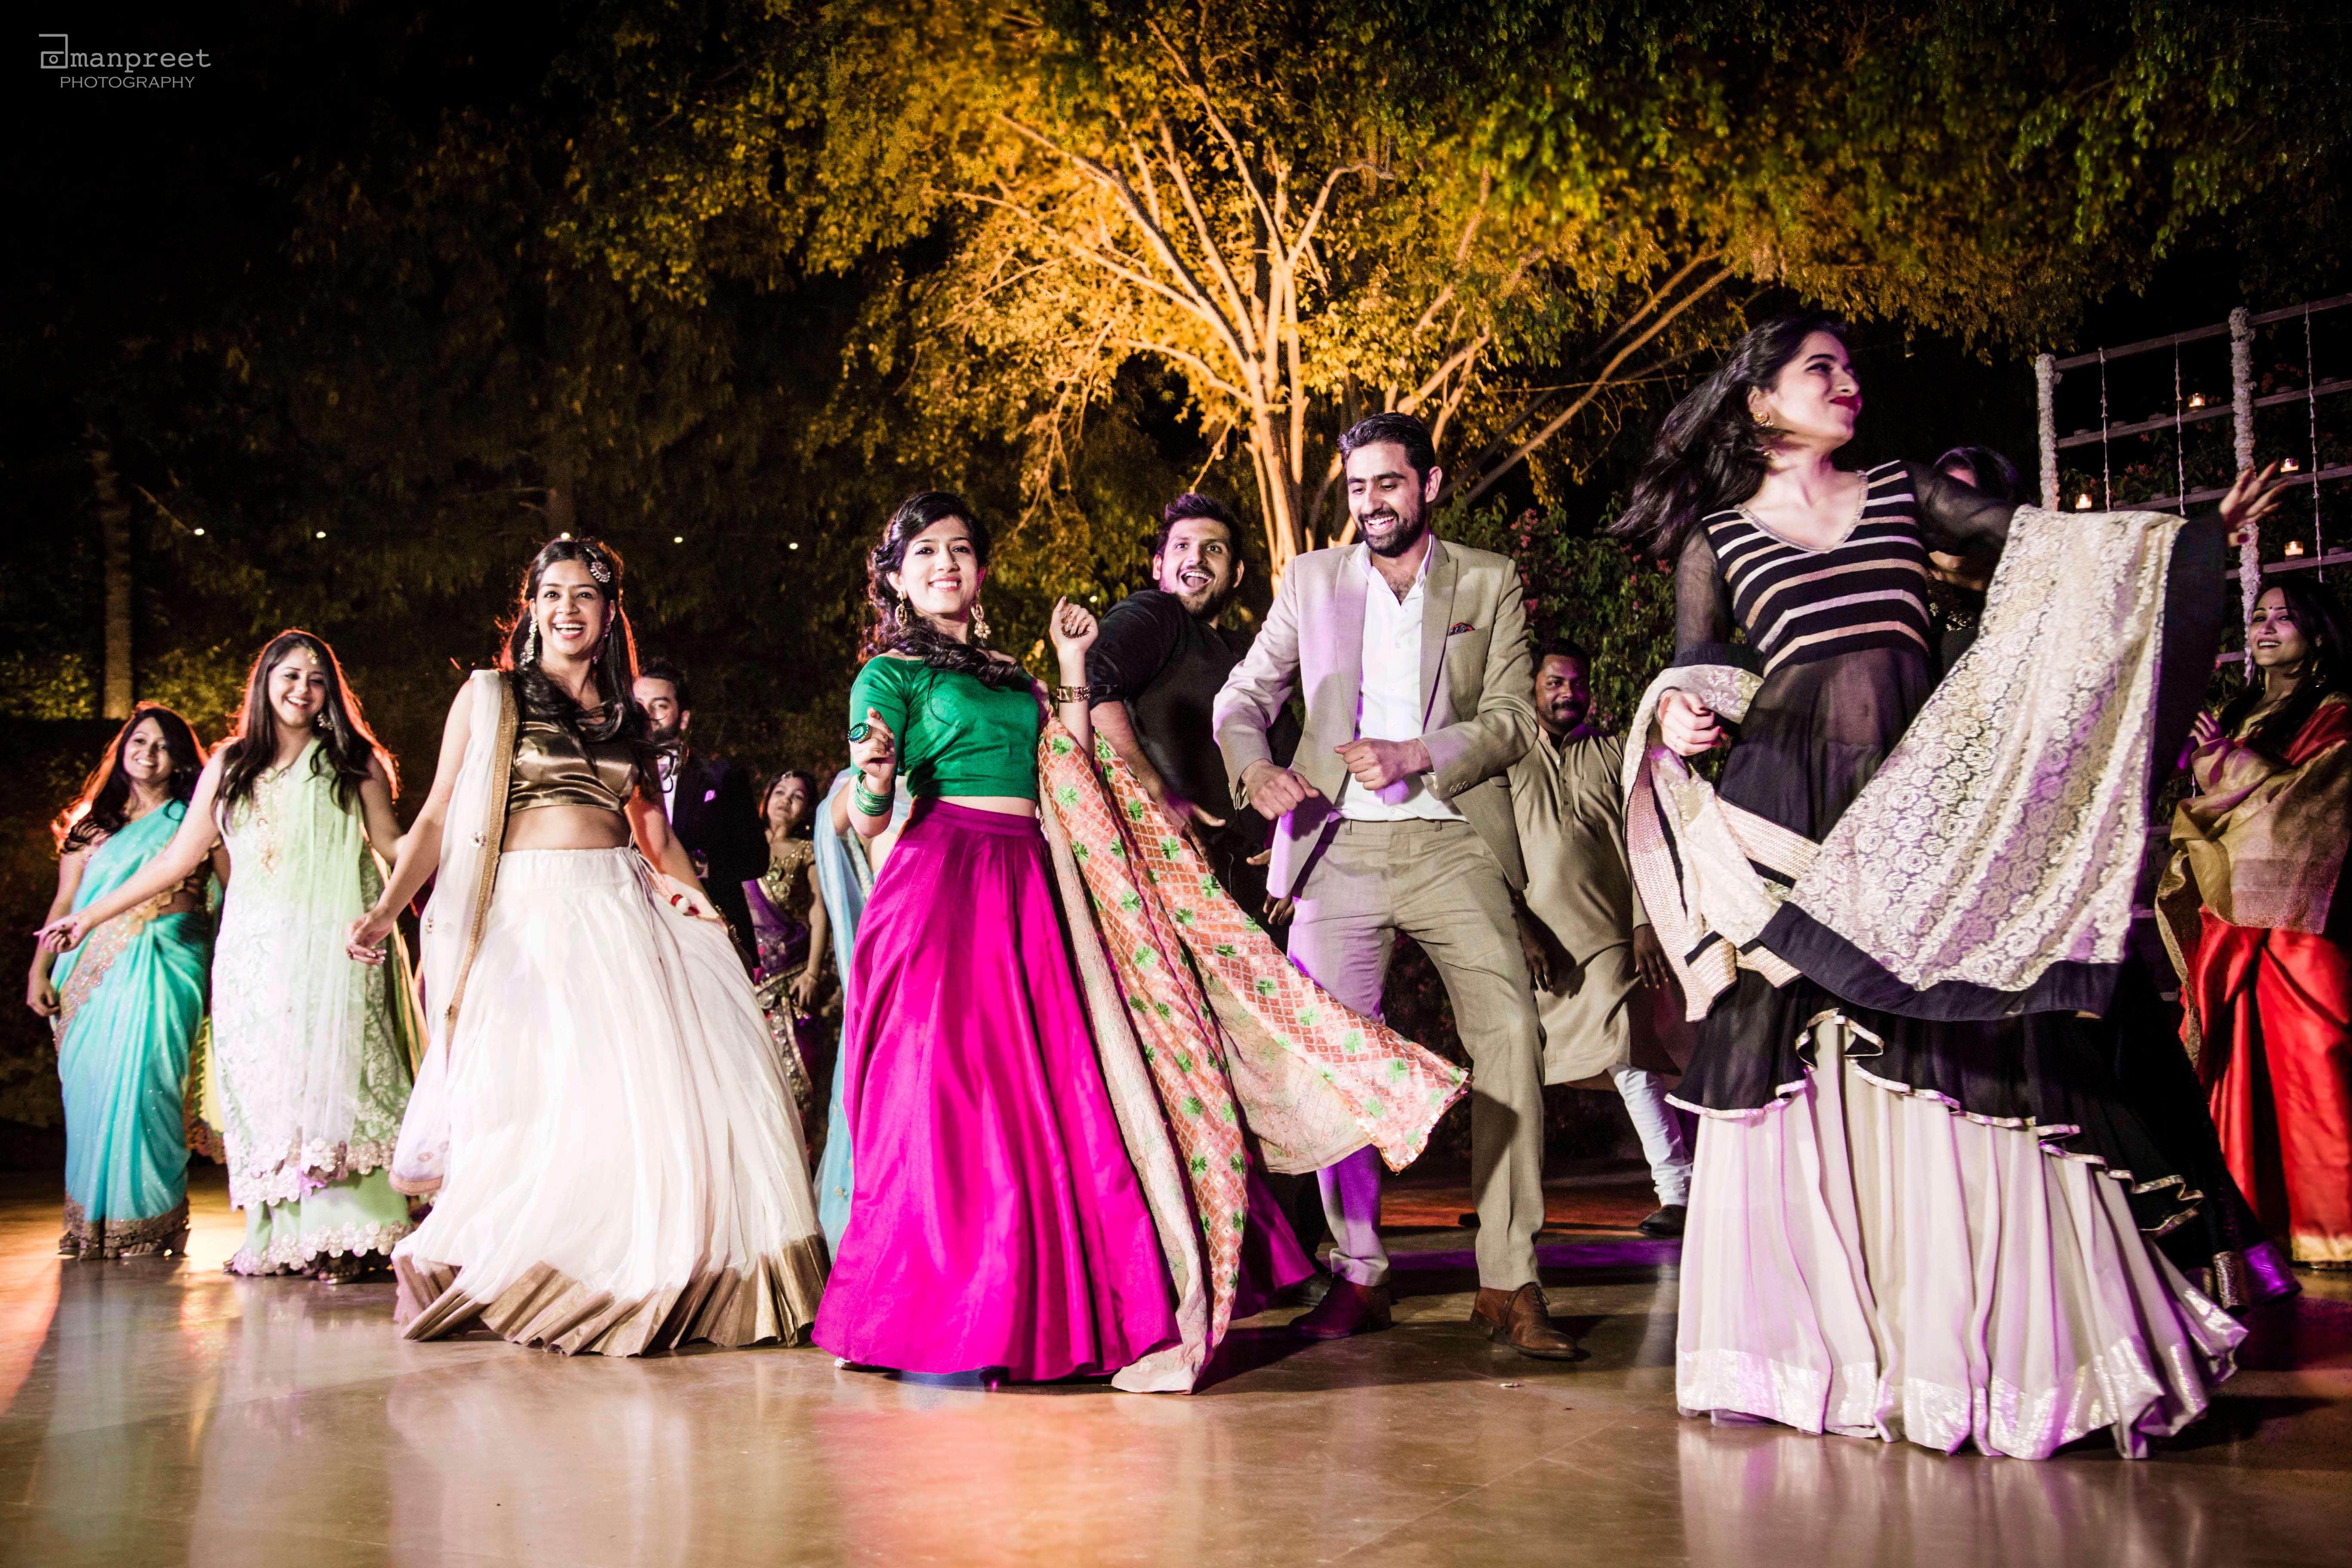 the wedding celebration!:geetanjali salon, raju mehandi wala, amanpreet photography, ole couture